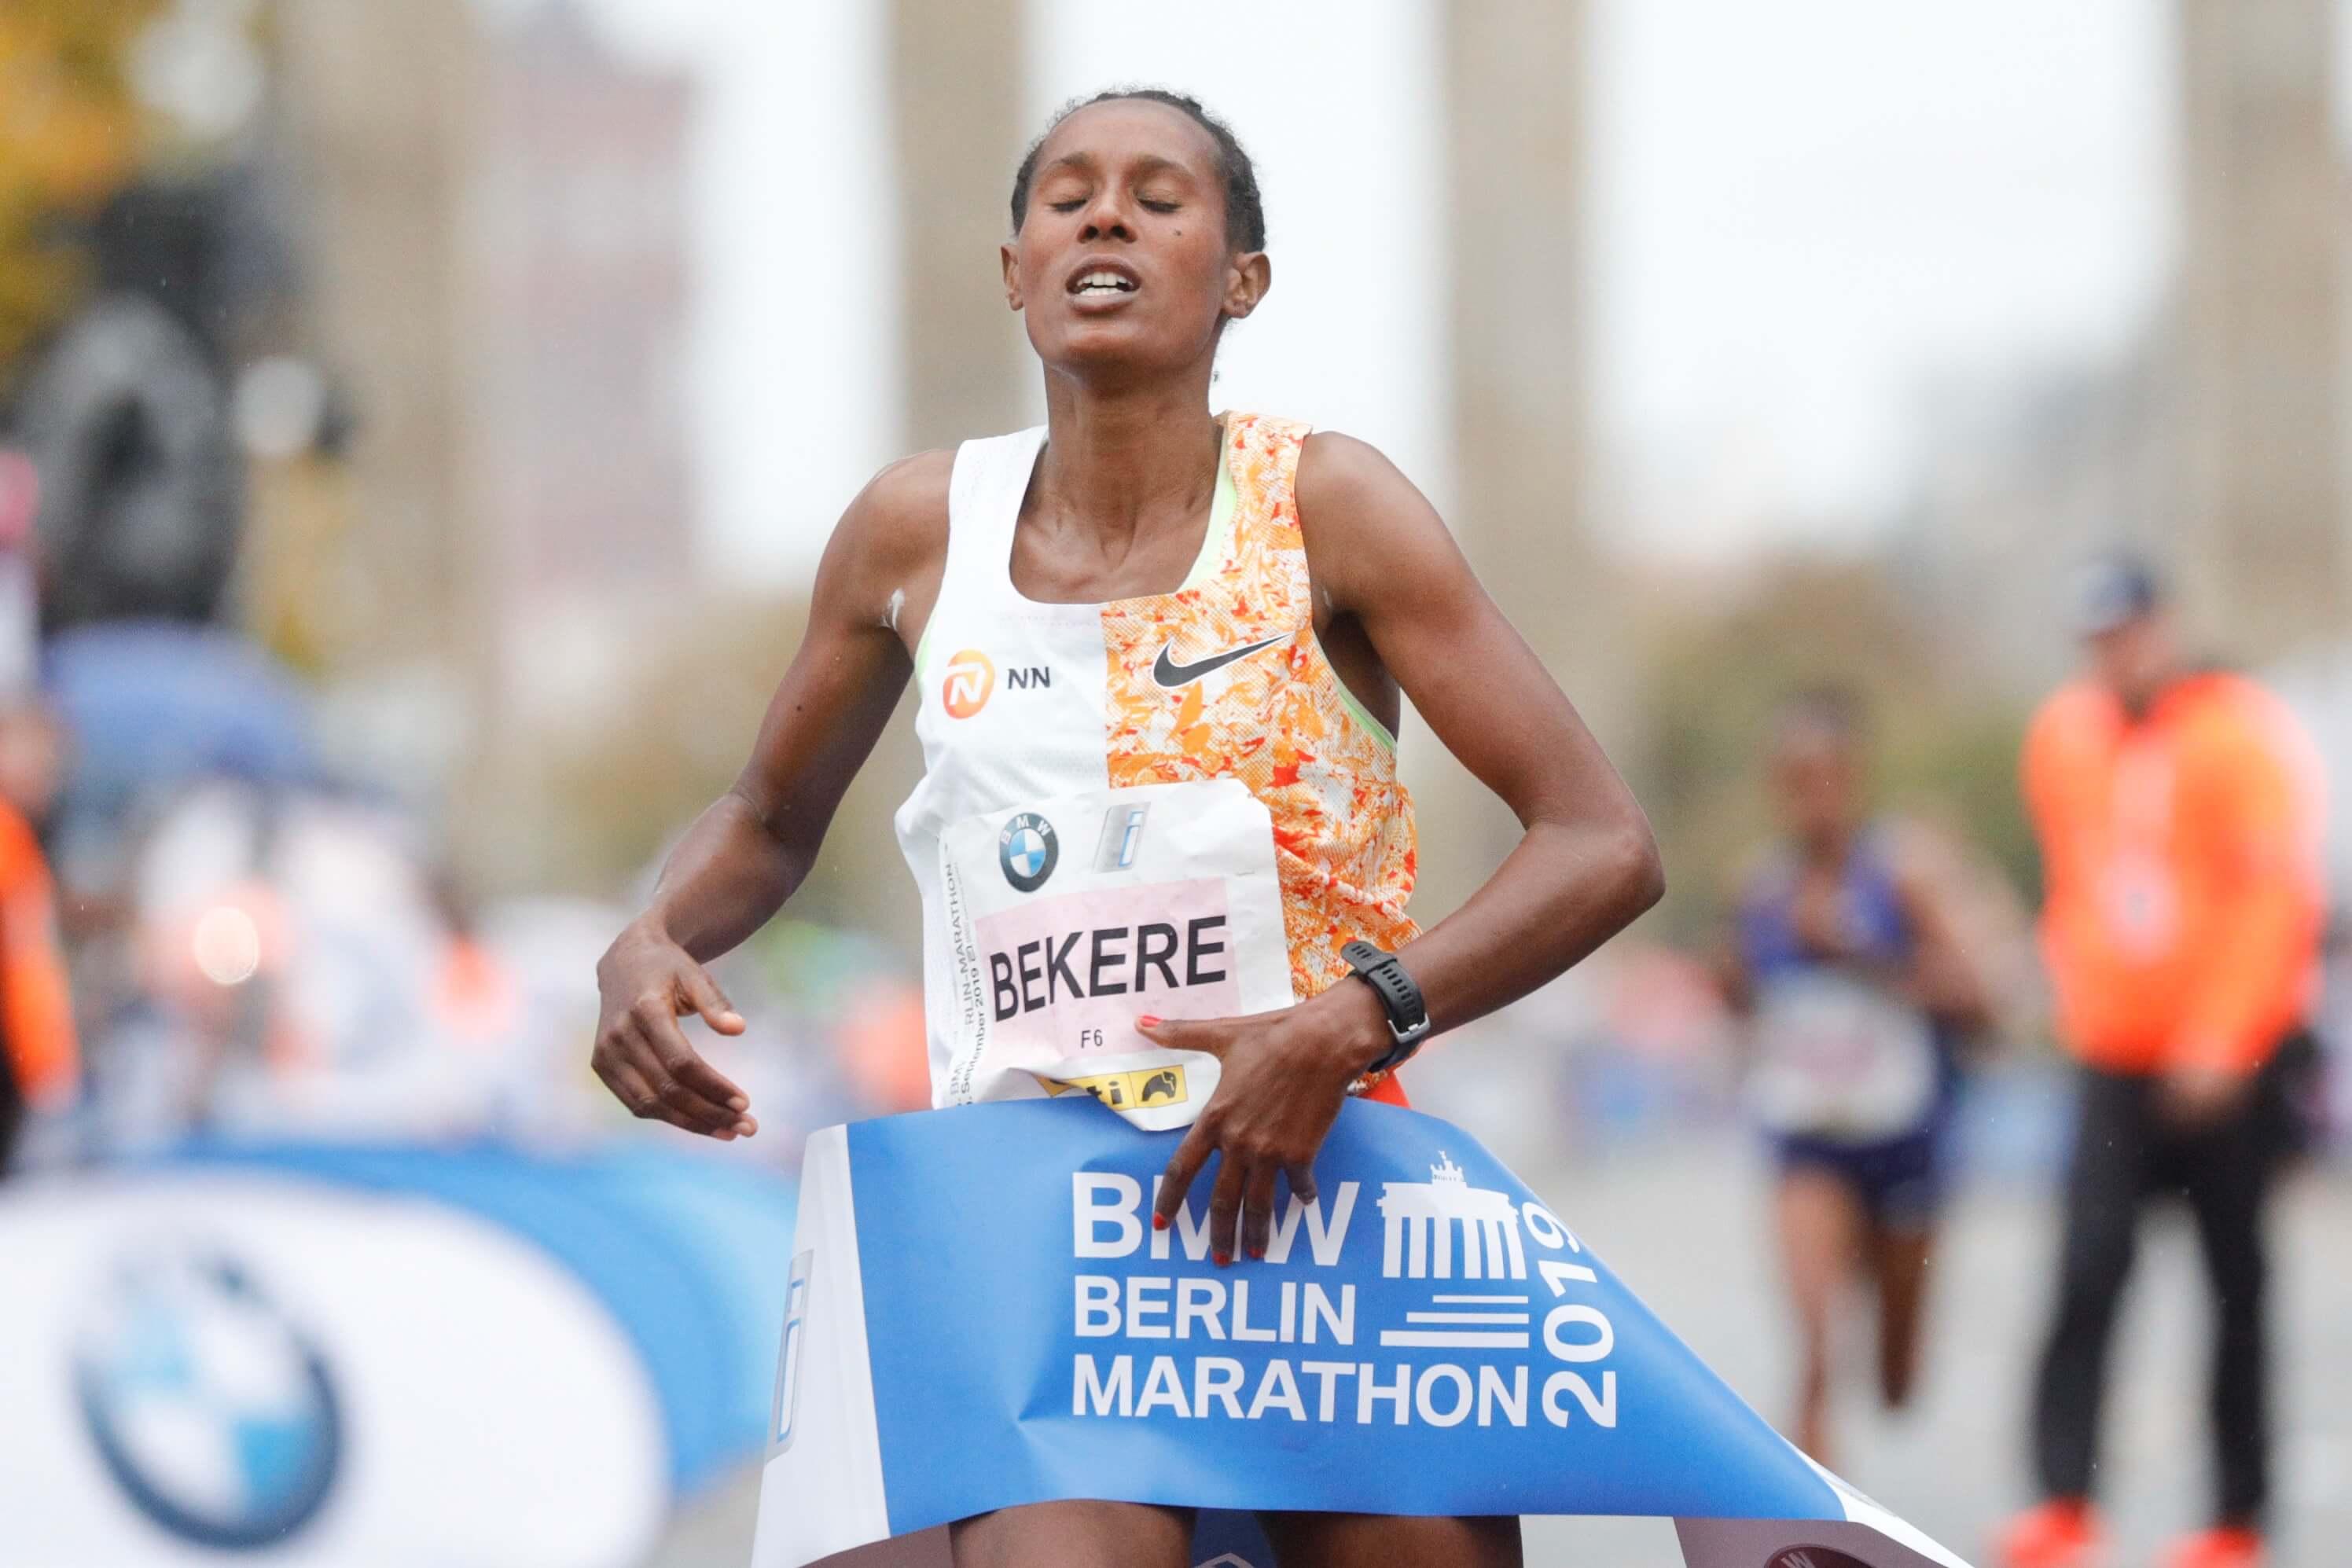 BMW BERLIN MARATHON: Flash News: Kenenisa Bekele verpasst